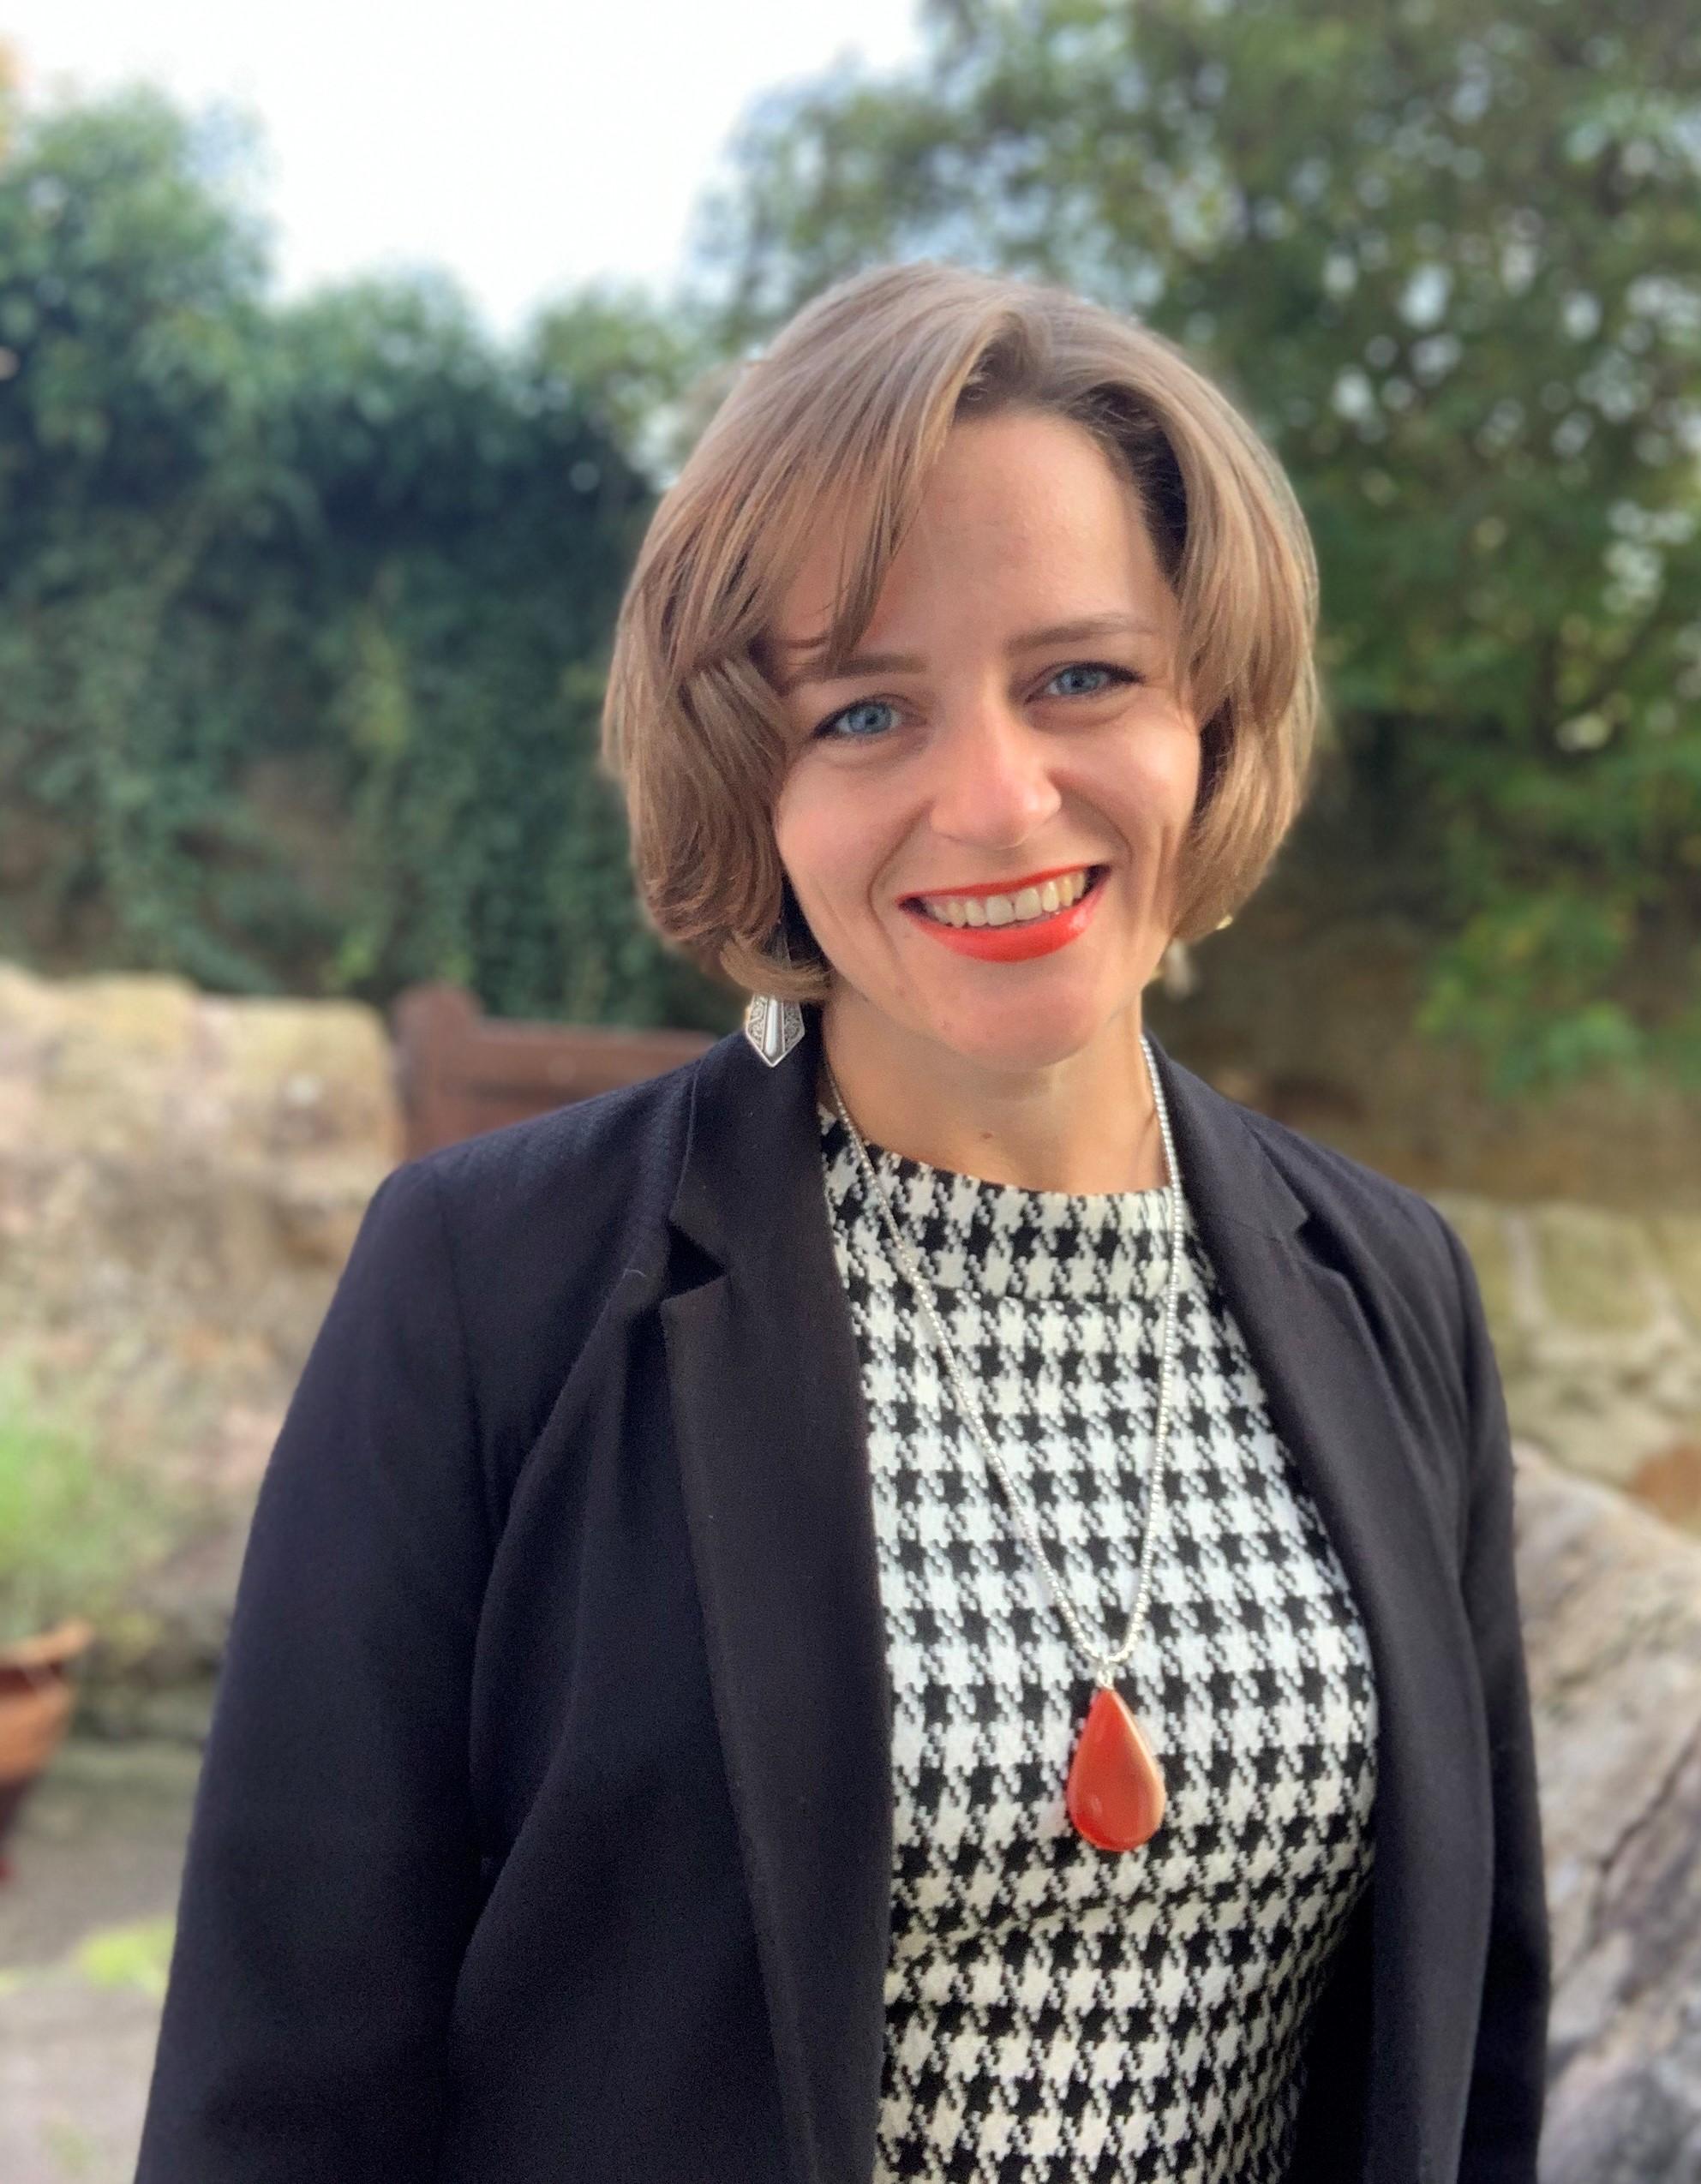 Katharina Cepa